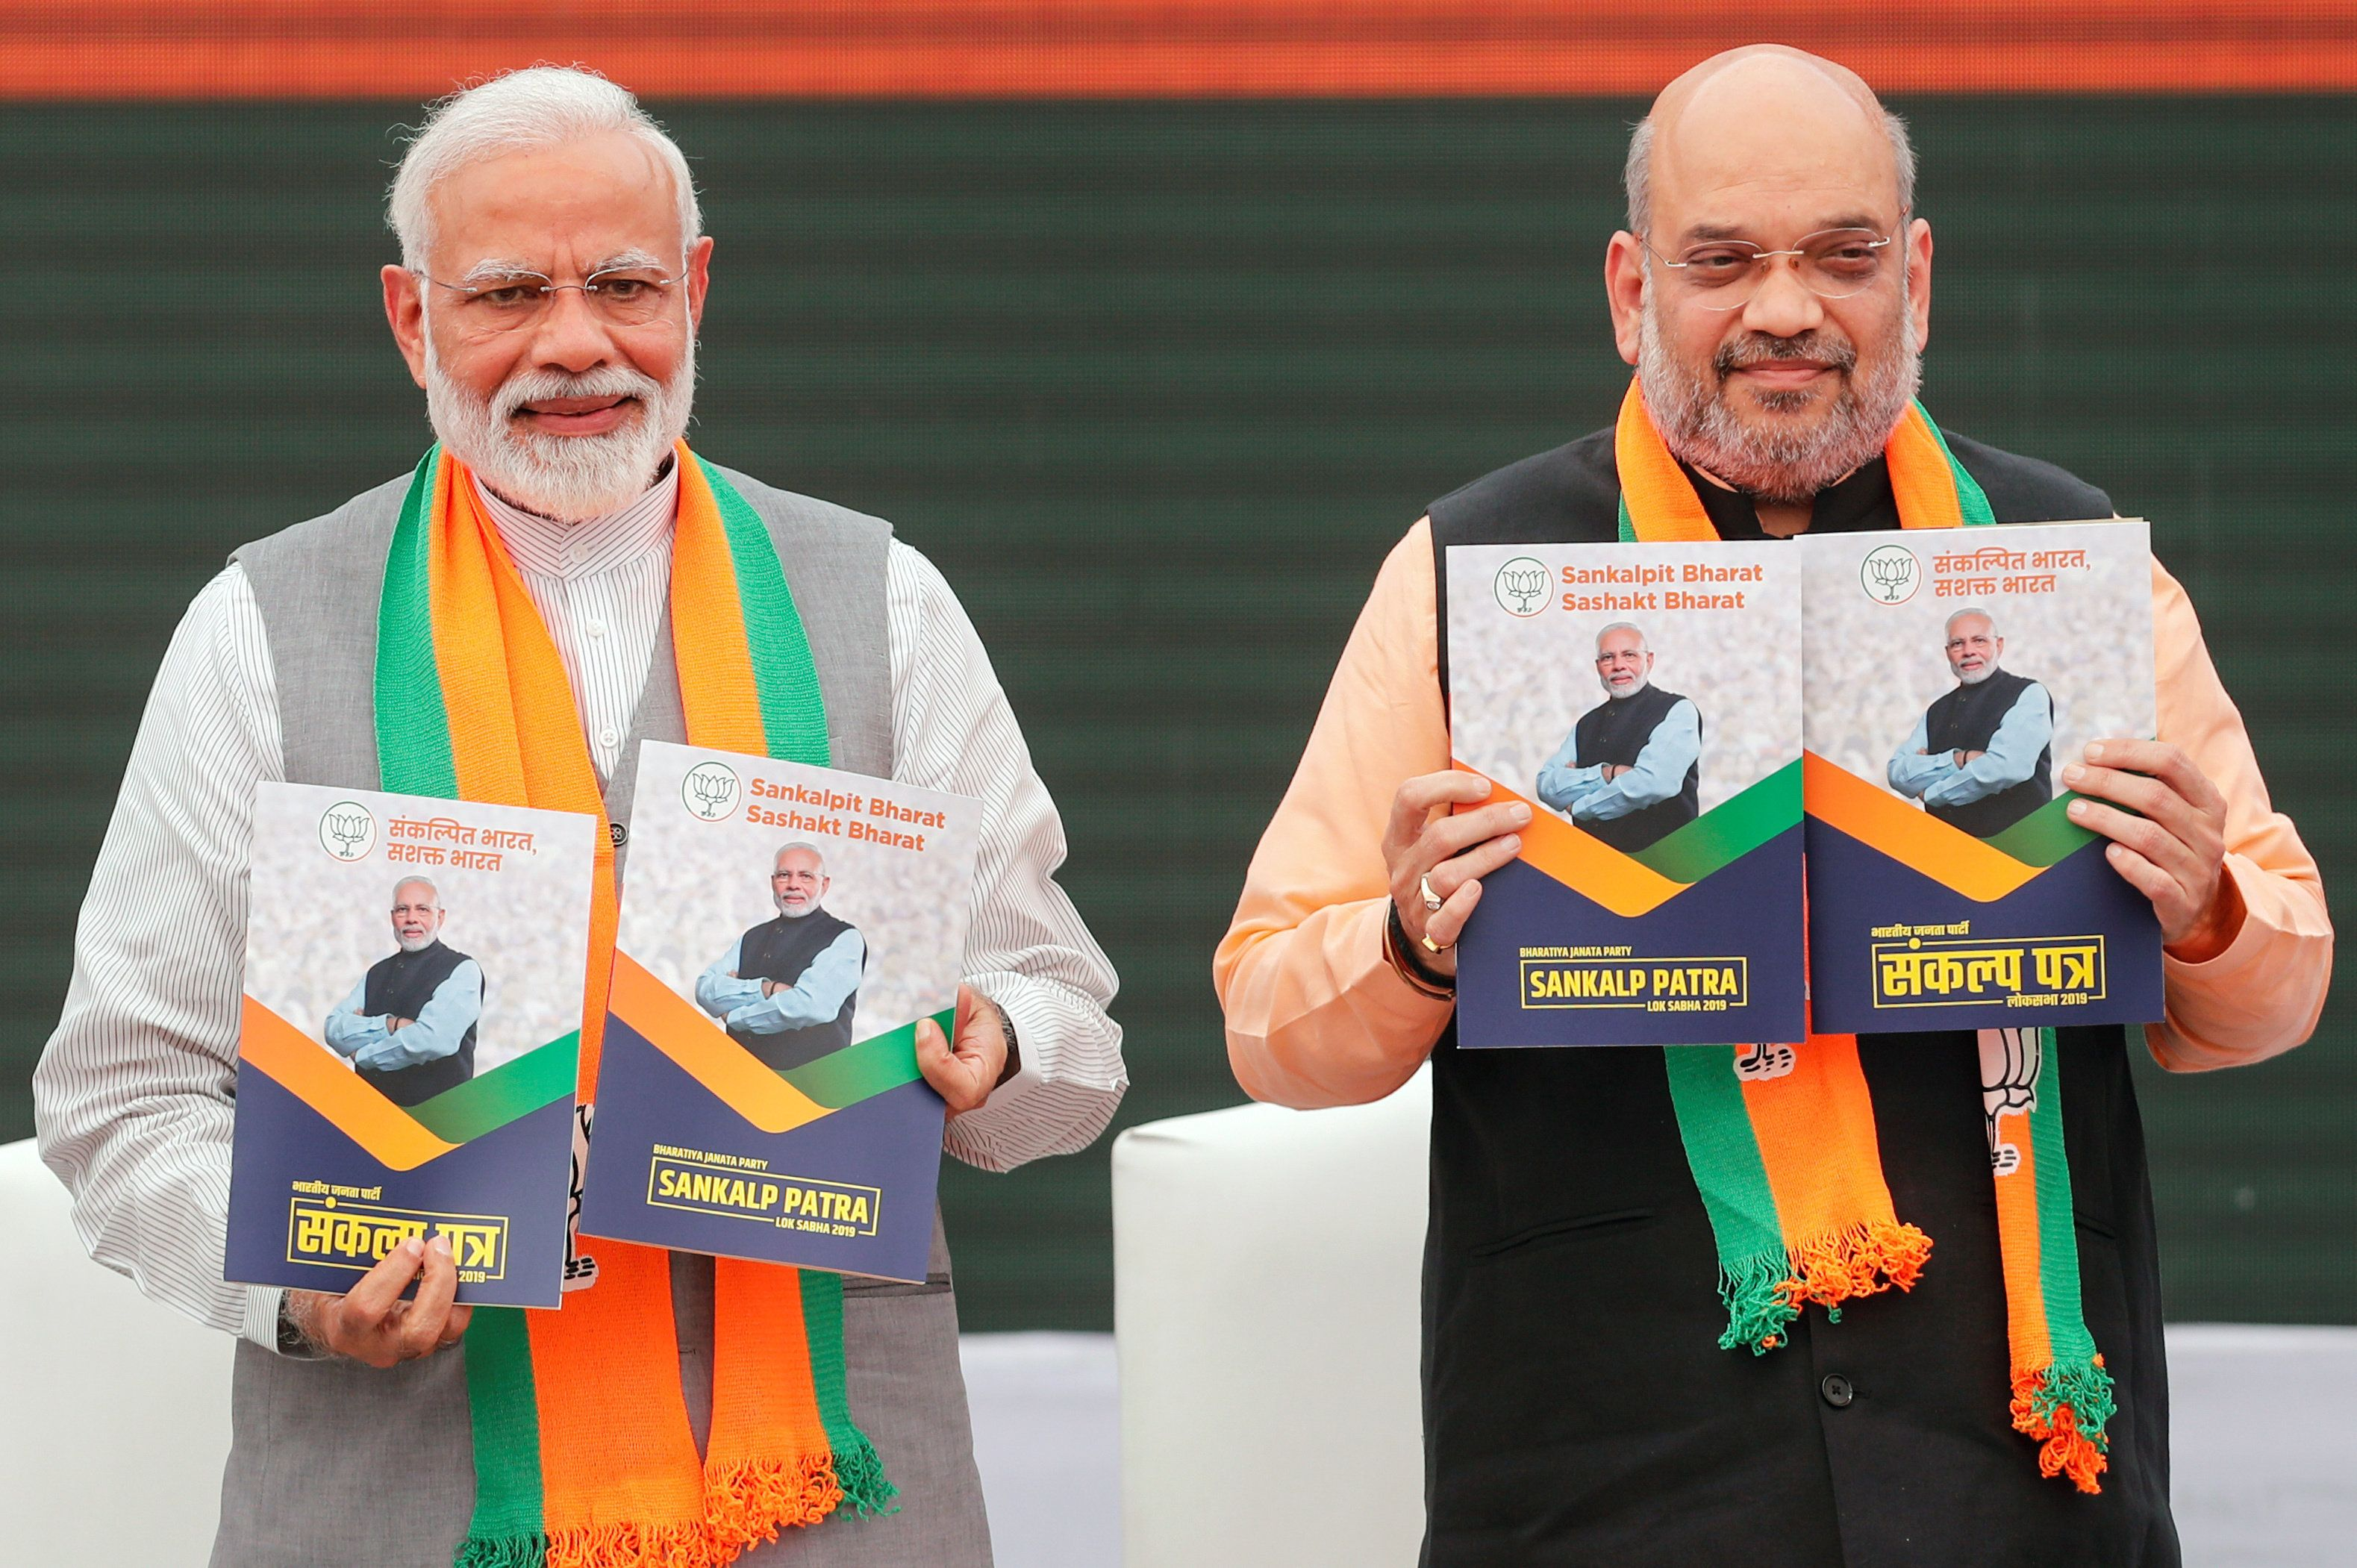 5 Key Takeaways From BJP Manifesto: Focus On National Security,